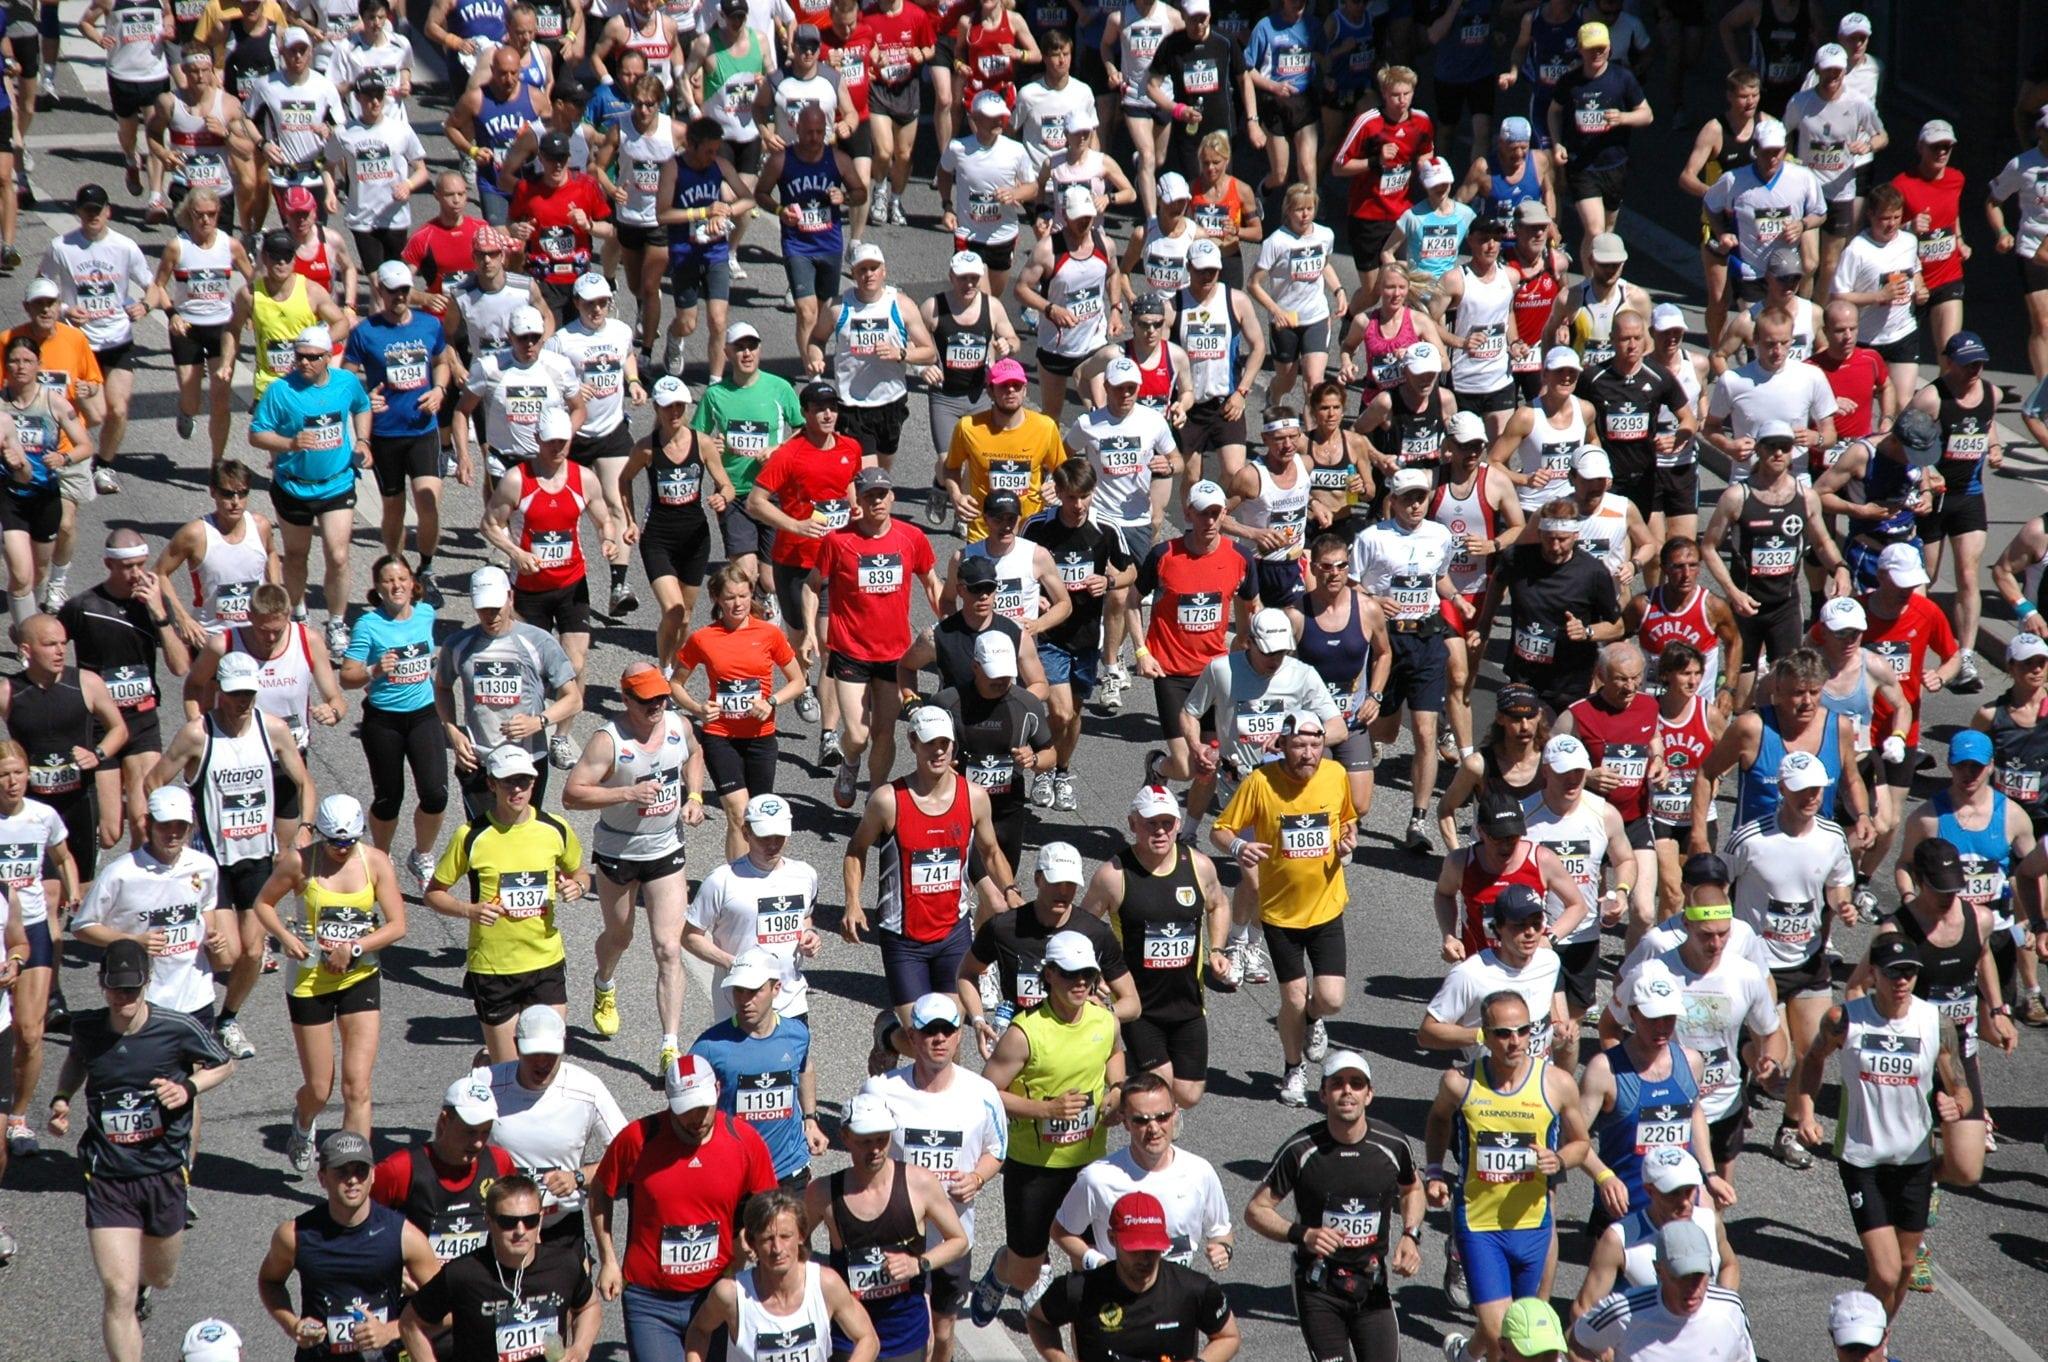 13 671 anmälda till Stockholm marathon